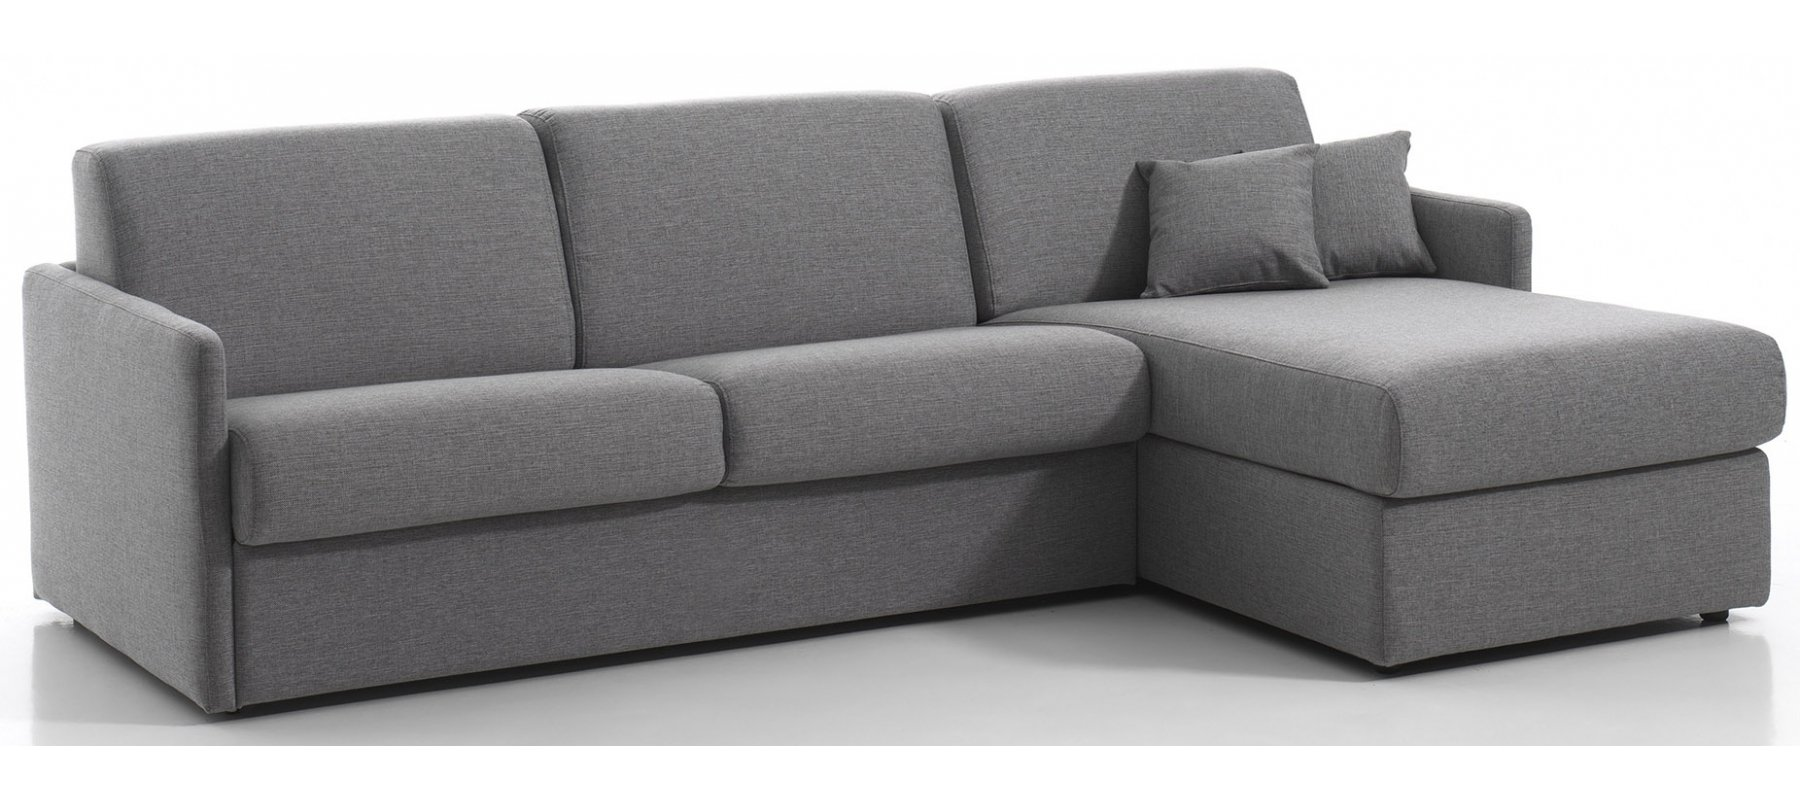 canap convertible d 39 angle montpellier couchage 120 cm avec rapido. Black Bedroom Furniture Sets. Home Design Ideas